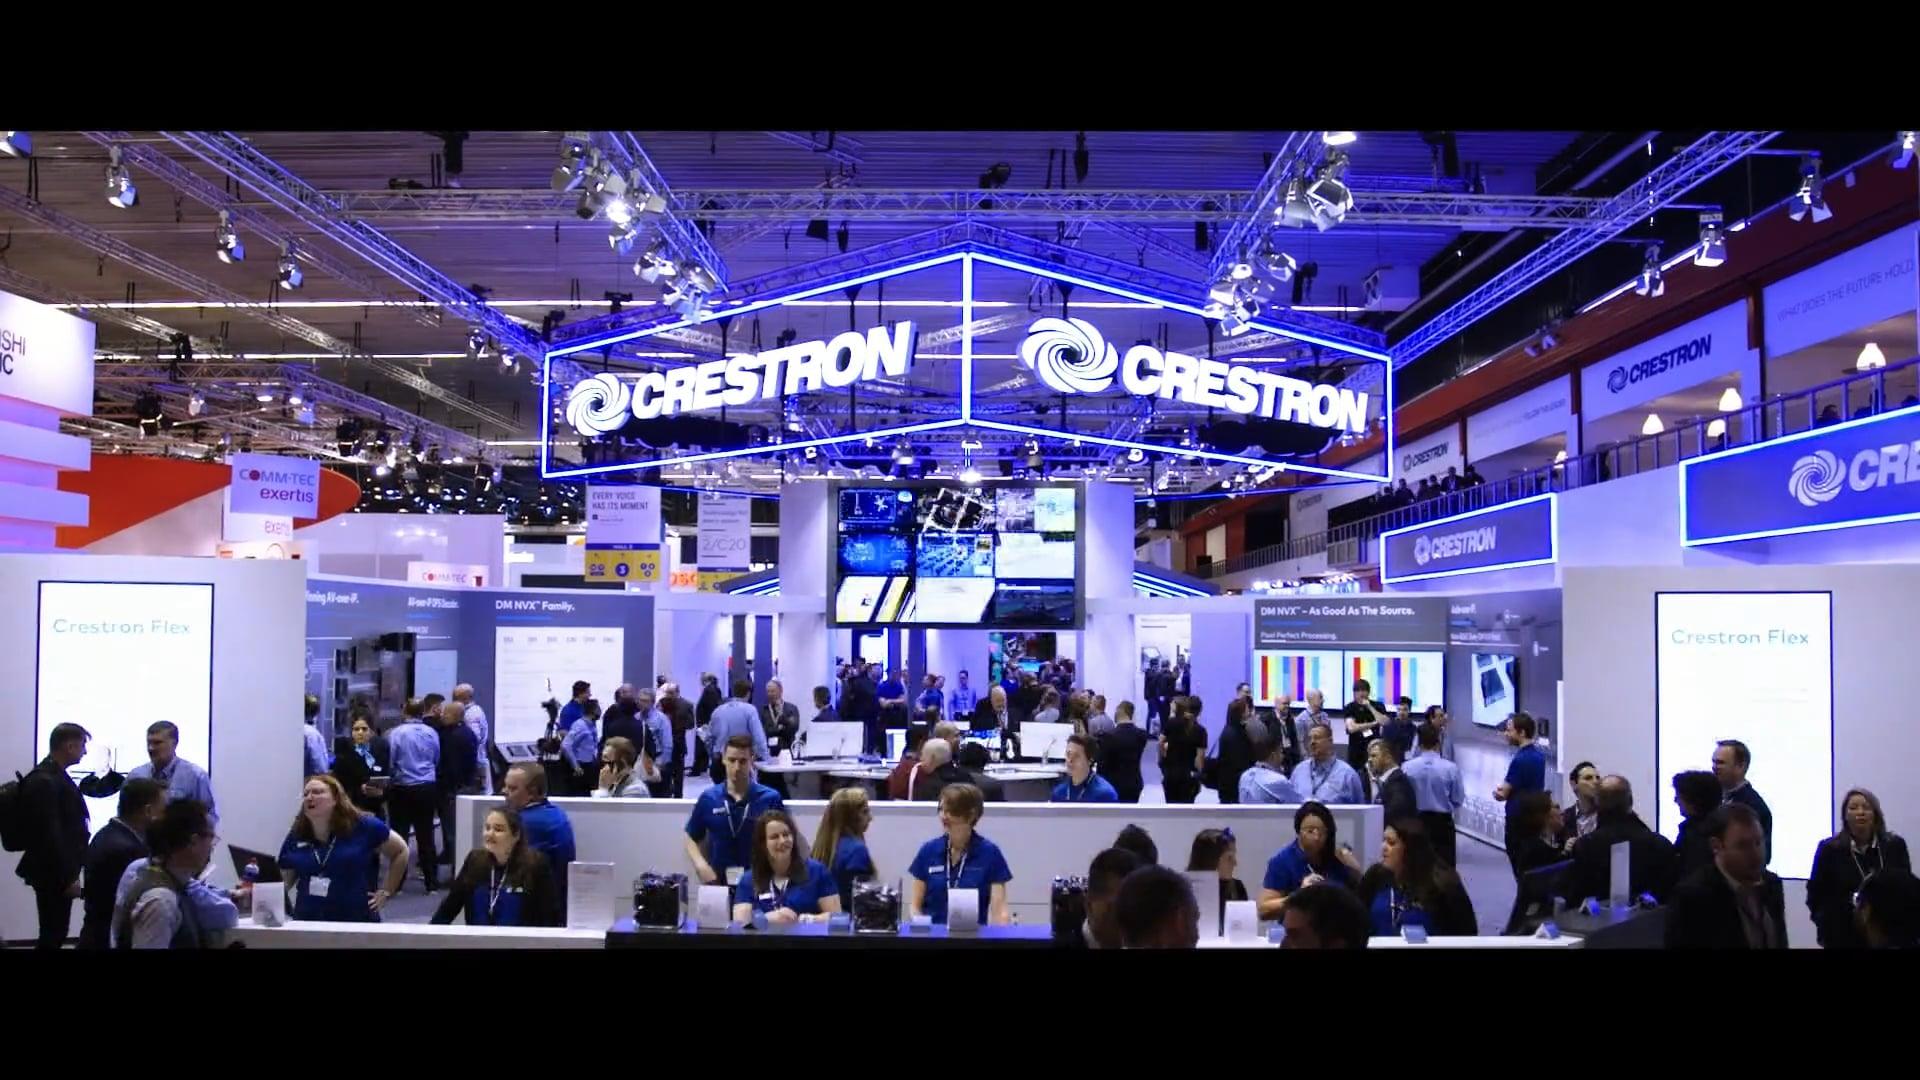 Life and Tech Intégrateur Crestron